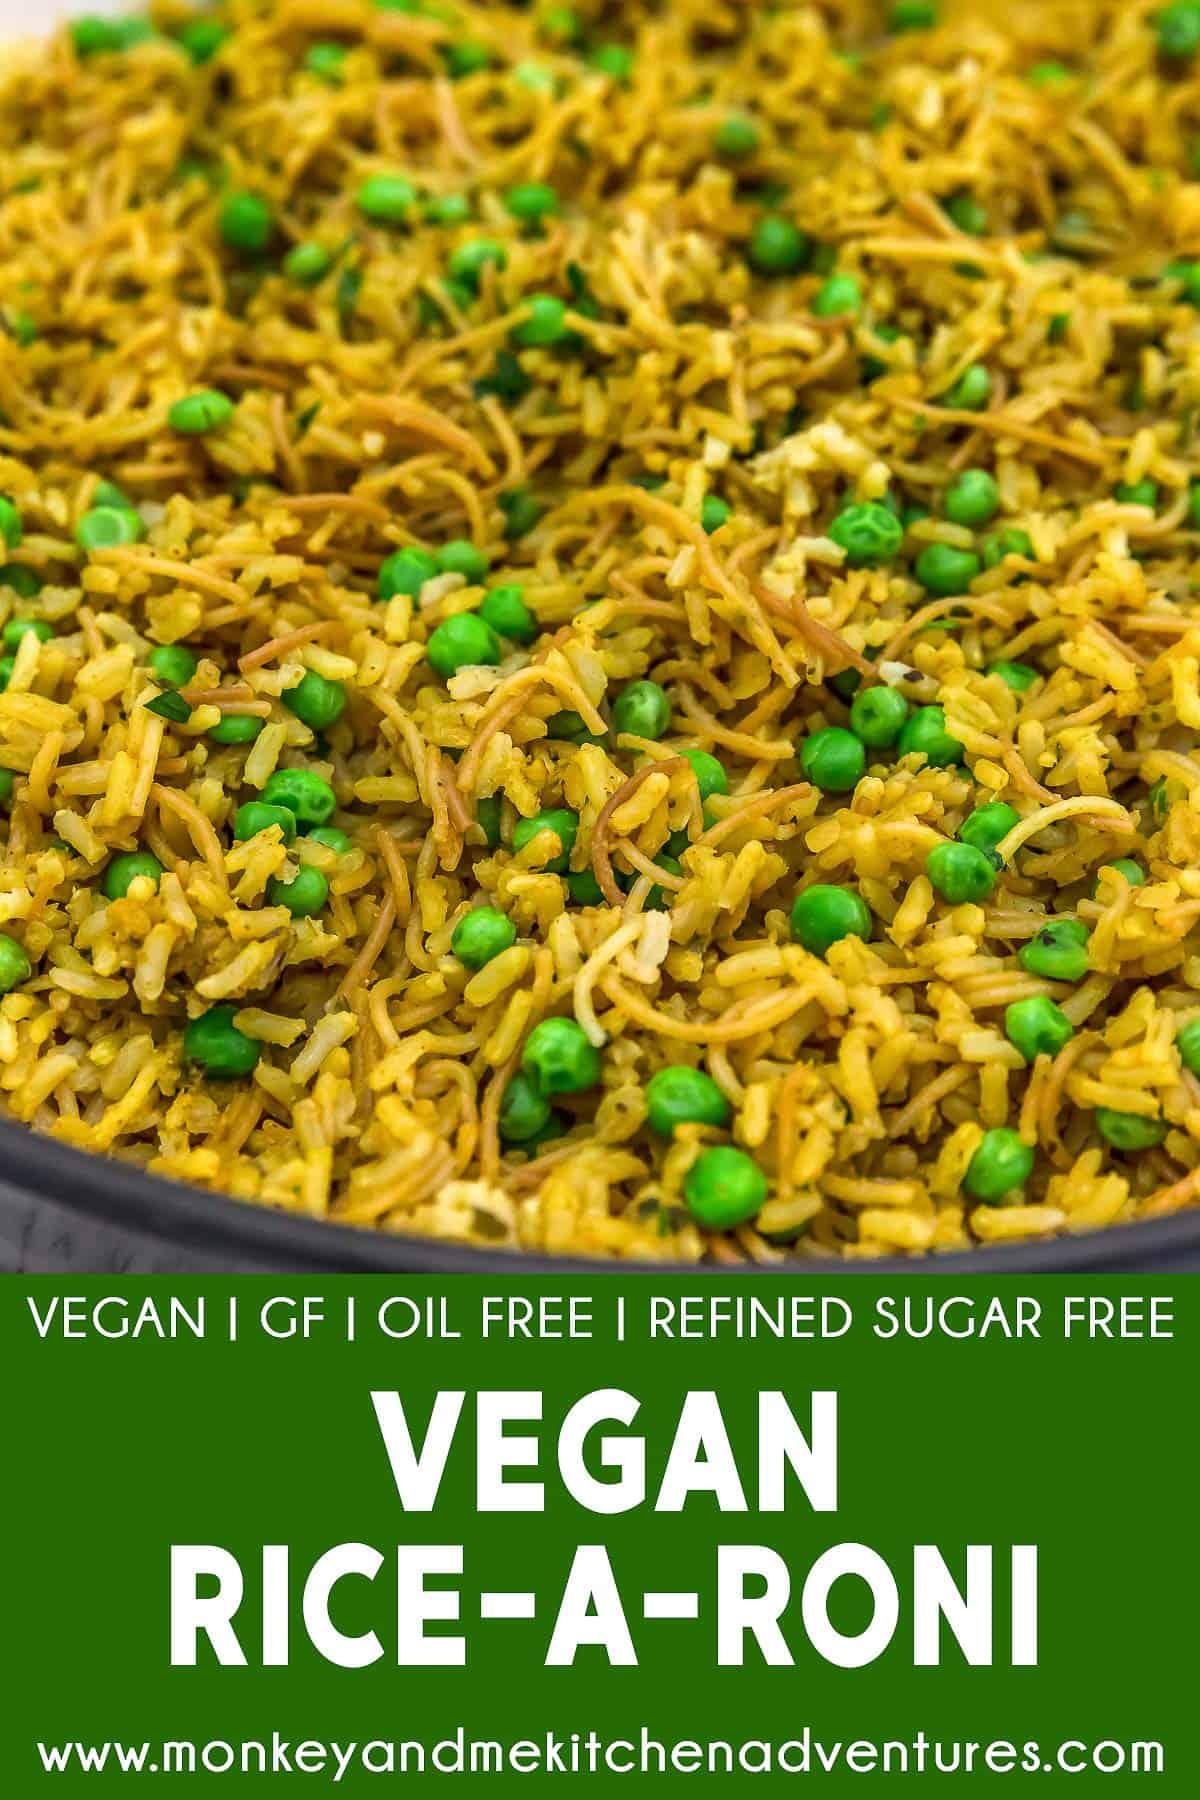 Vegan Rice-A-Roni